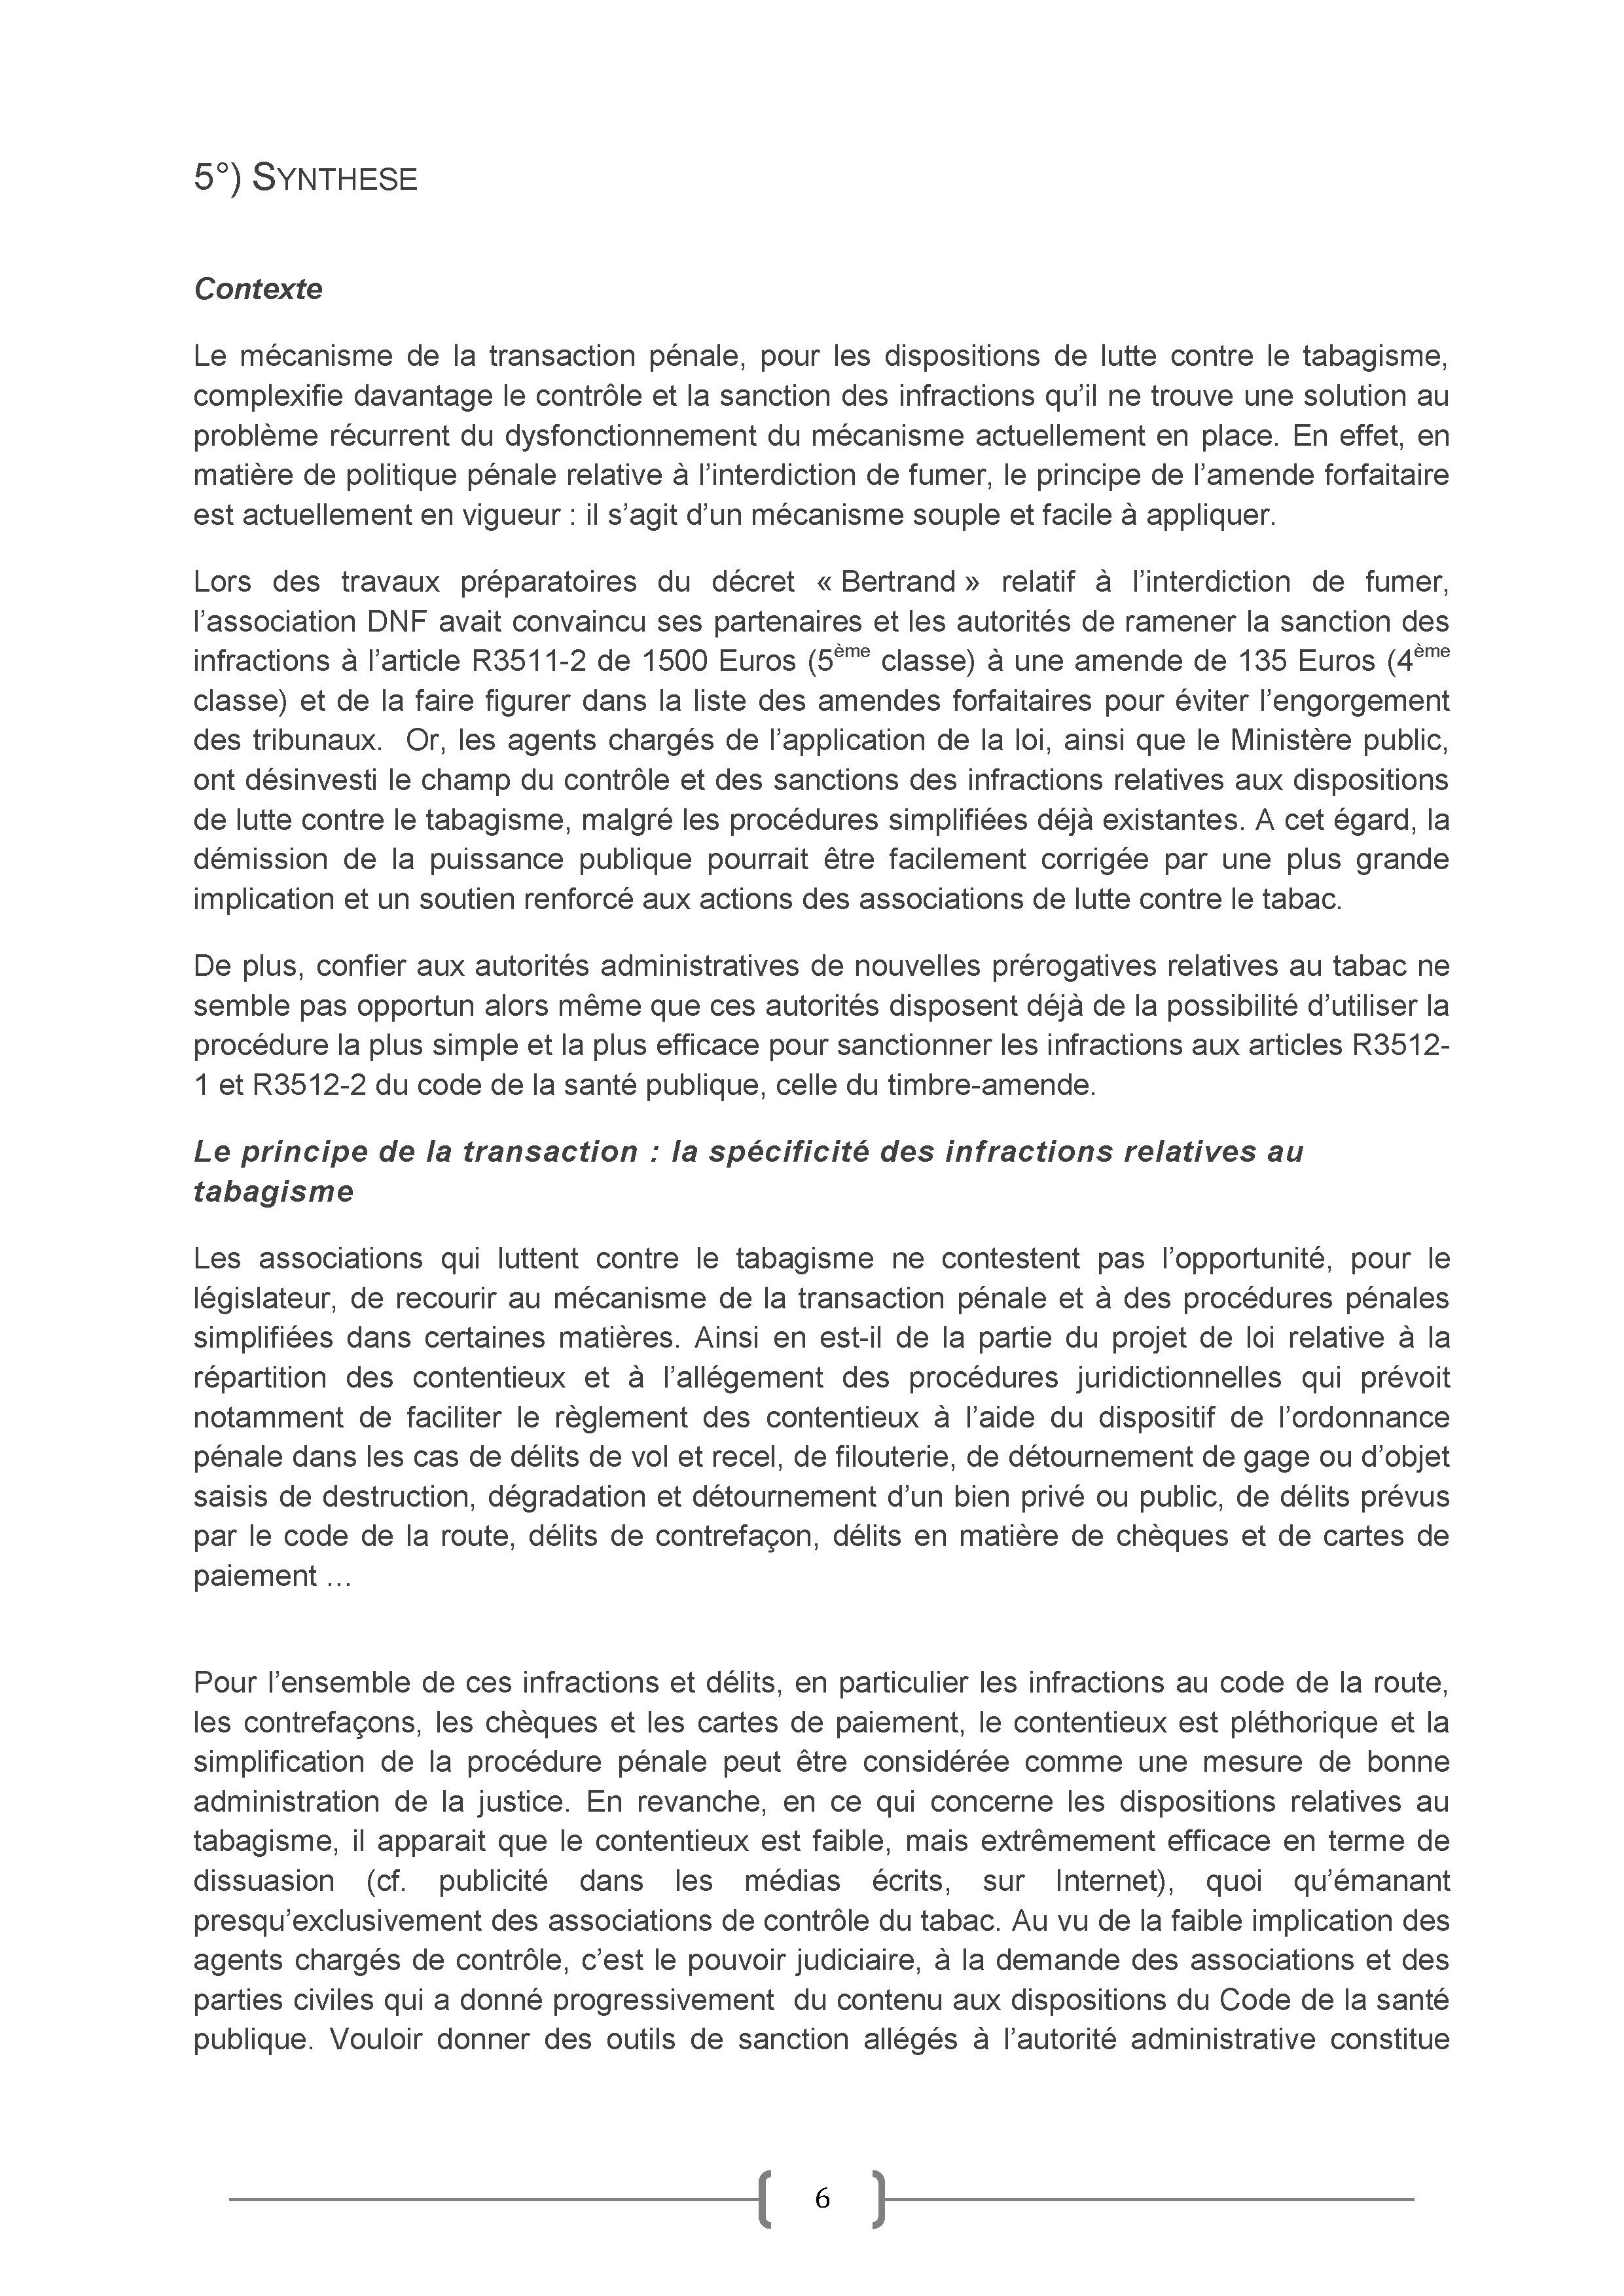 Alliance-DP_projet-loi-article-22-quater_05juil2011_Page_6.jpg